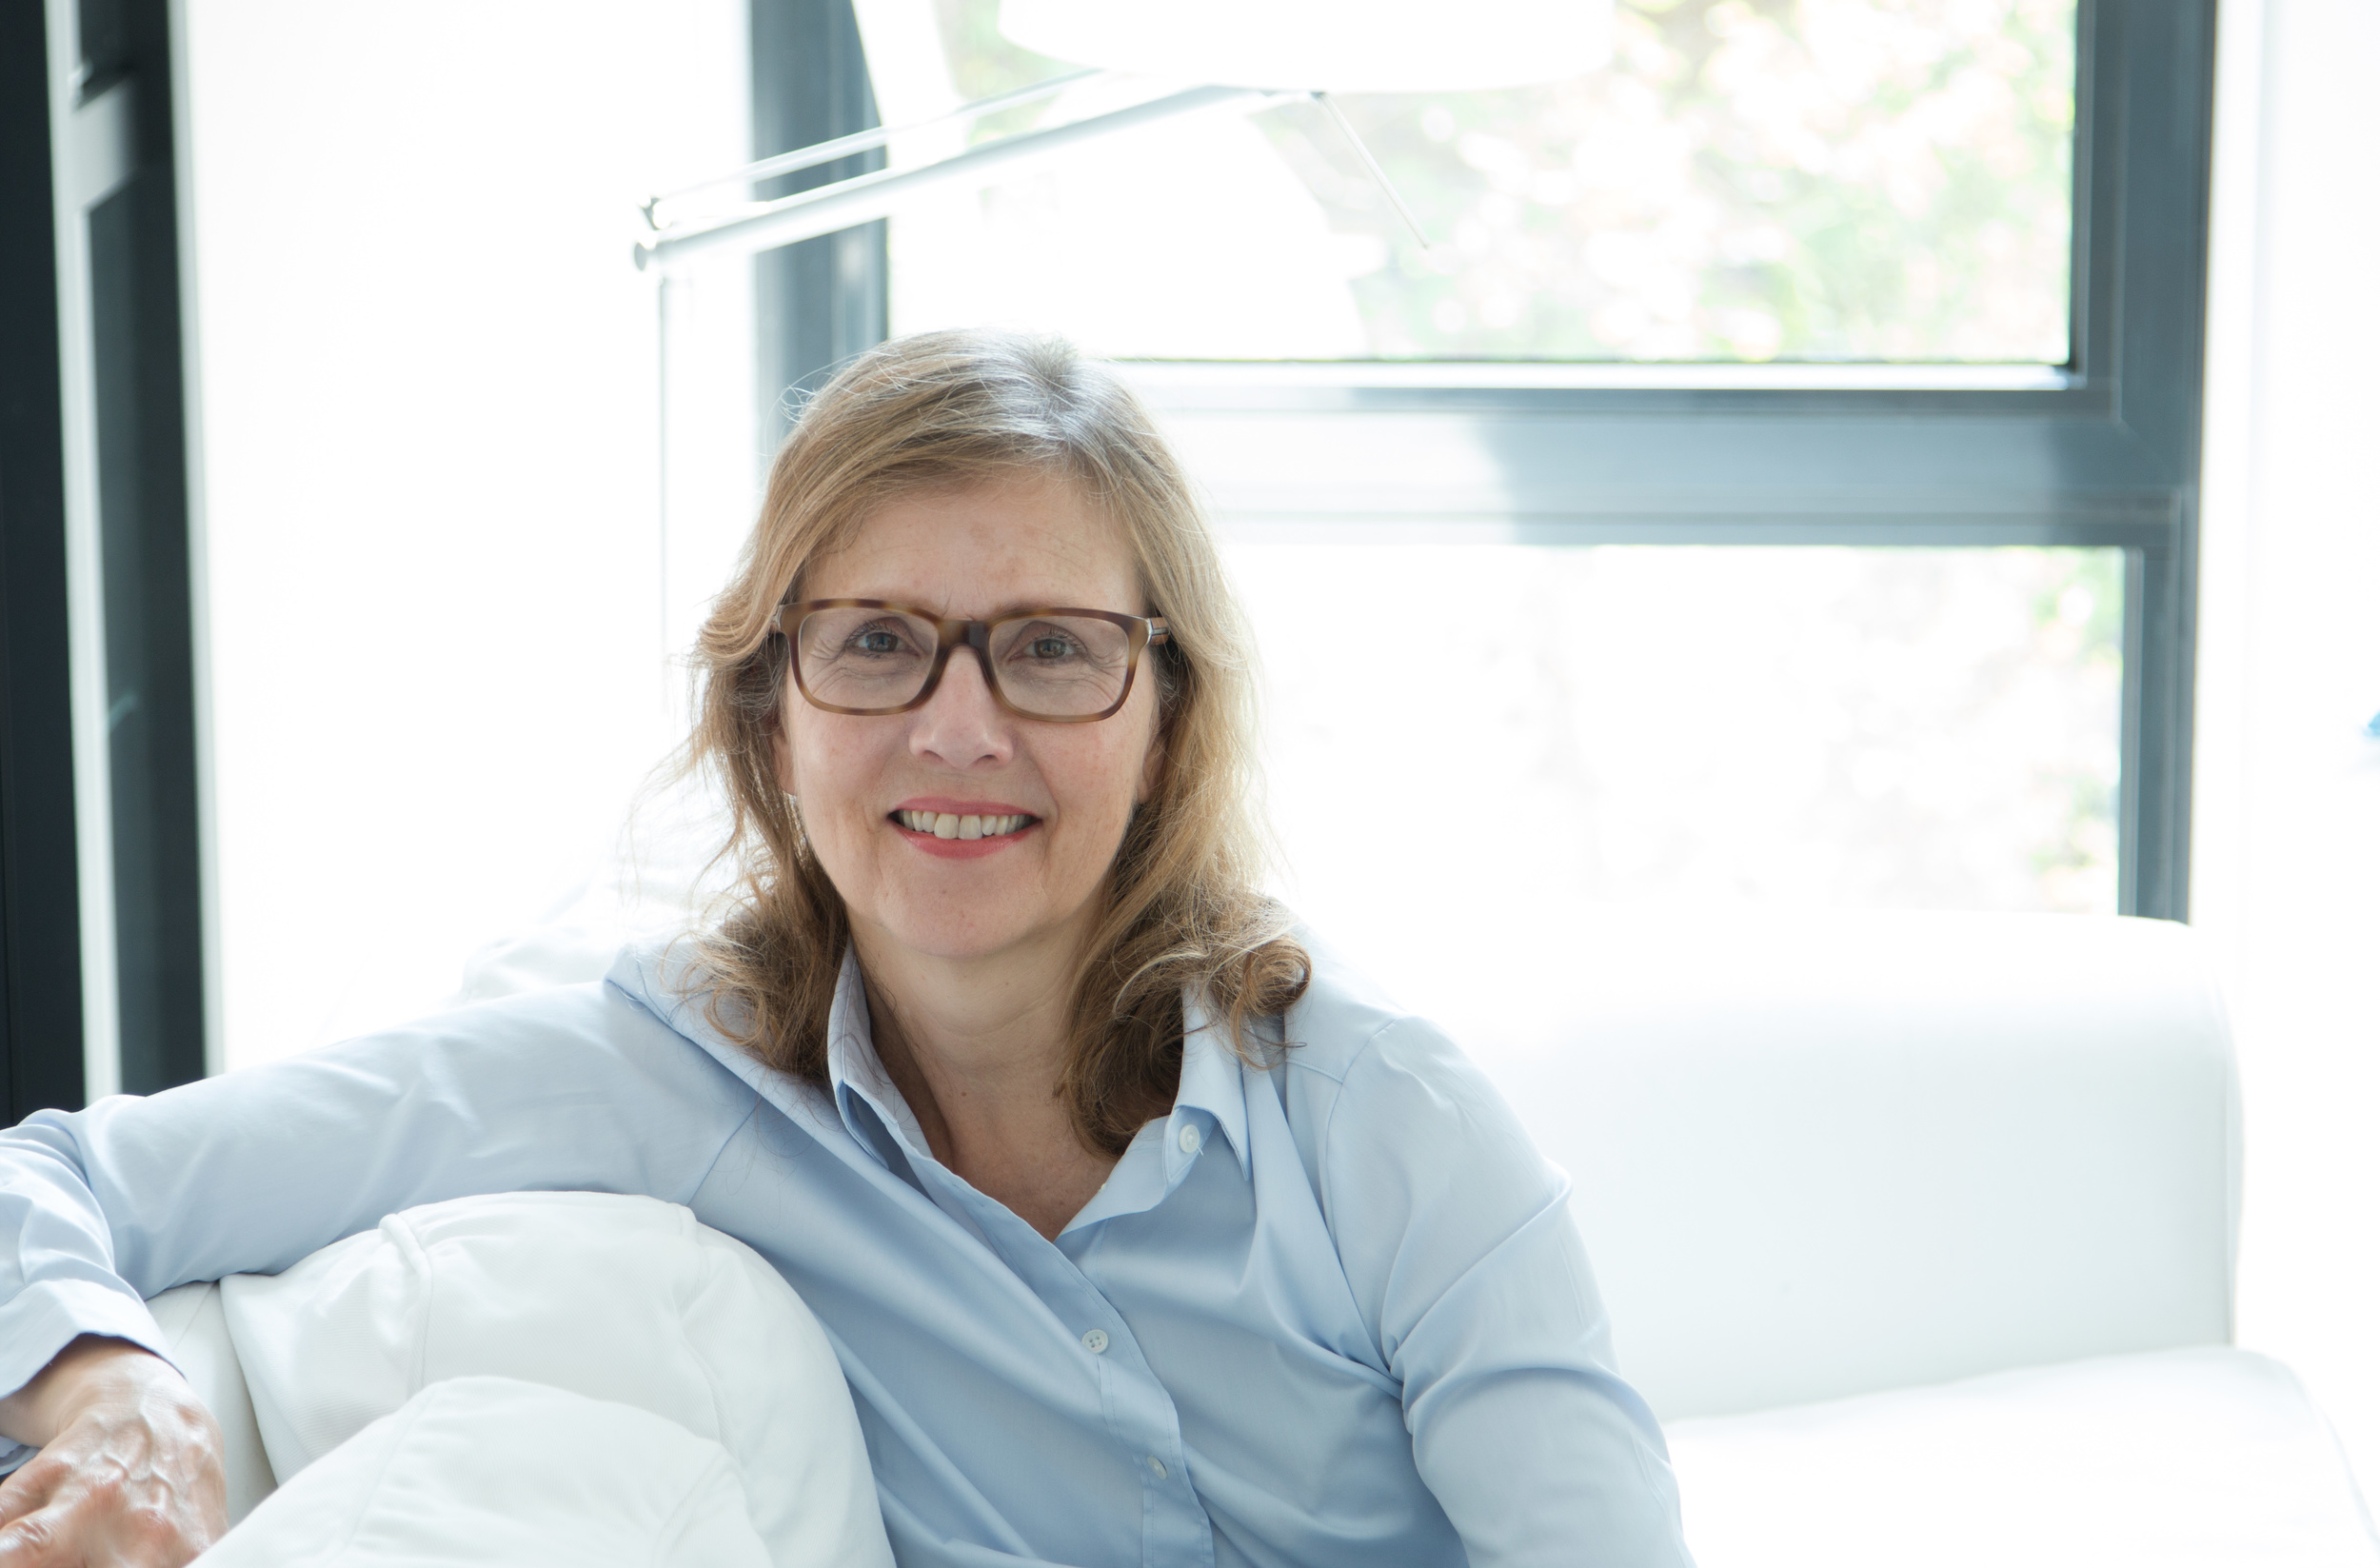 Diane Leclair Bisson picture2015